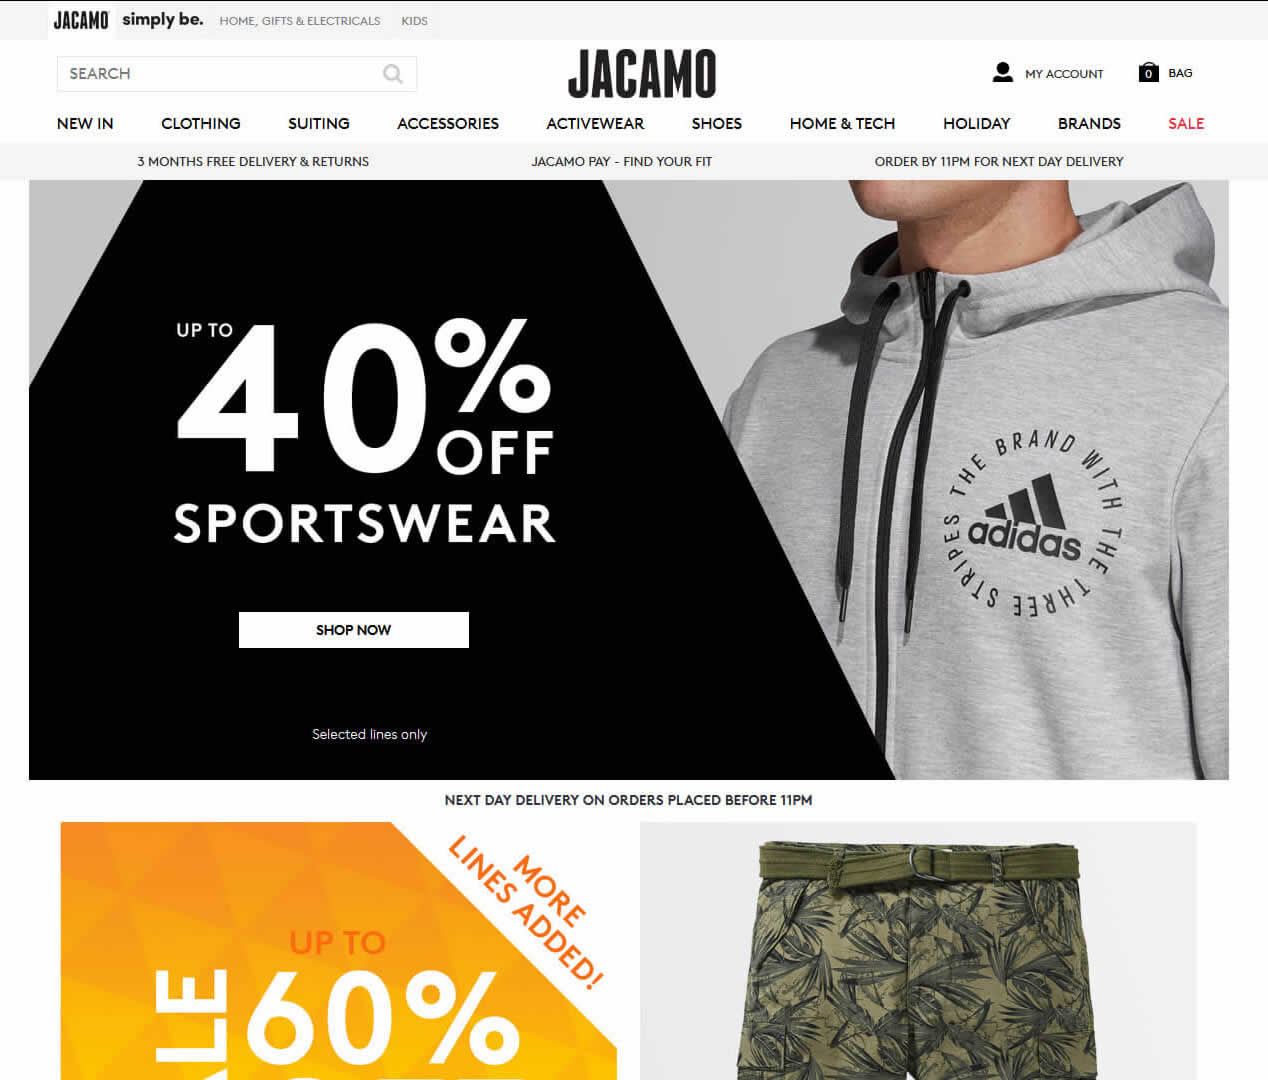 Jacamo home page